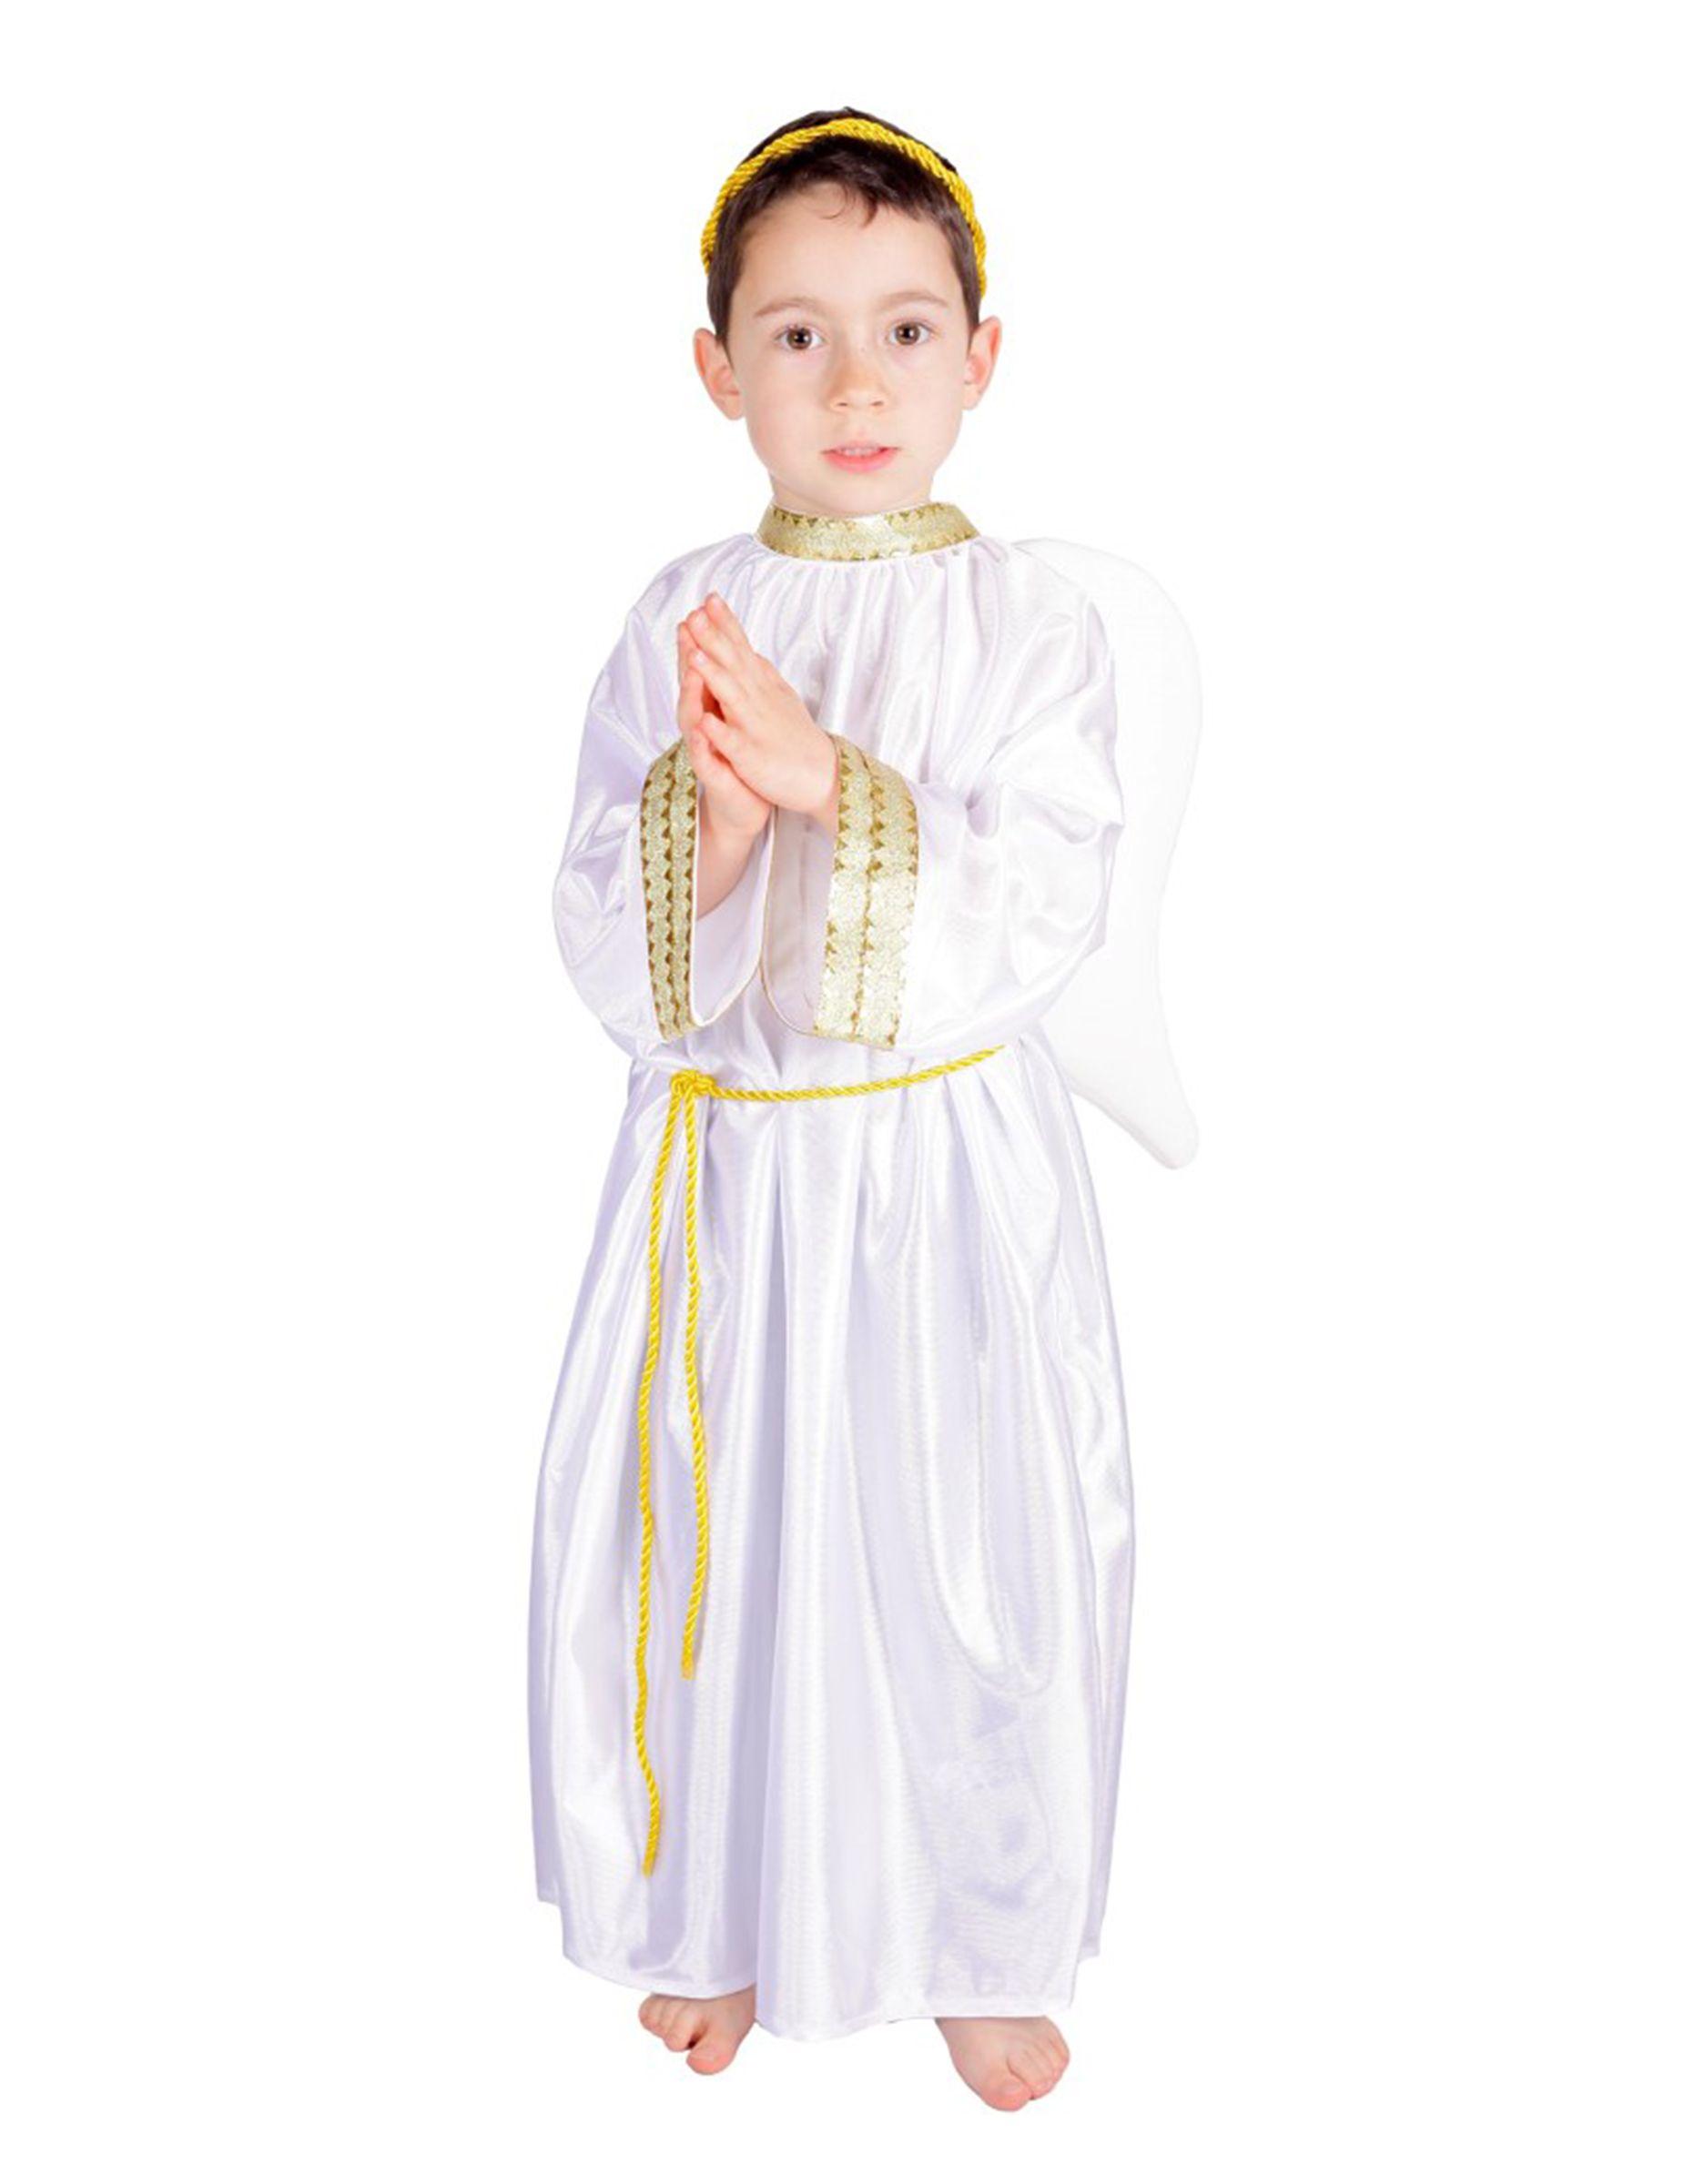 81a52ea34cce7 Disfraz ángel niño